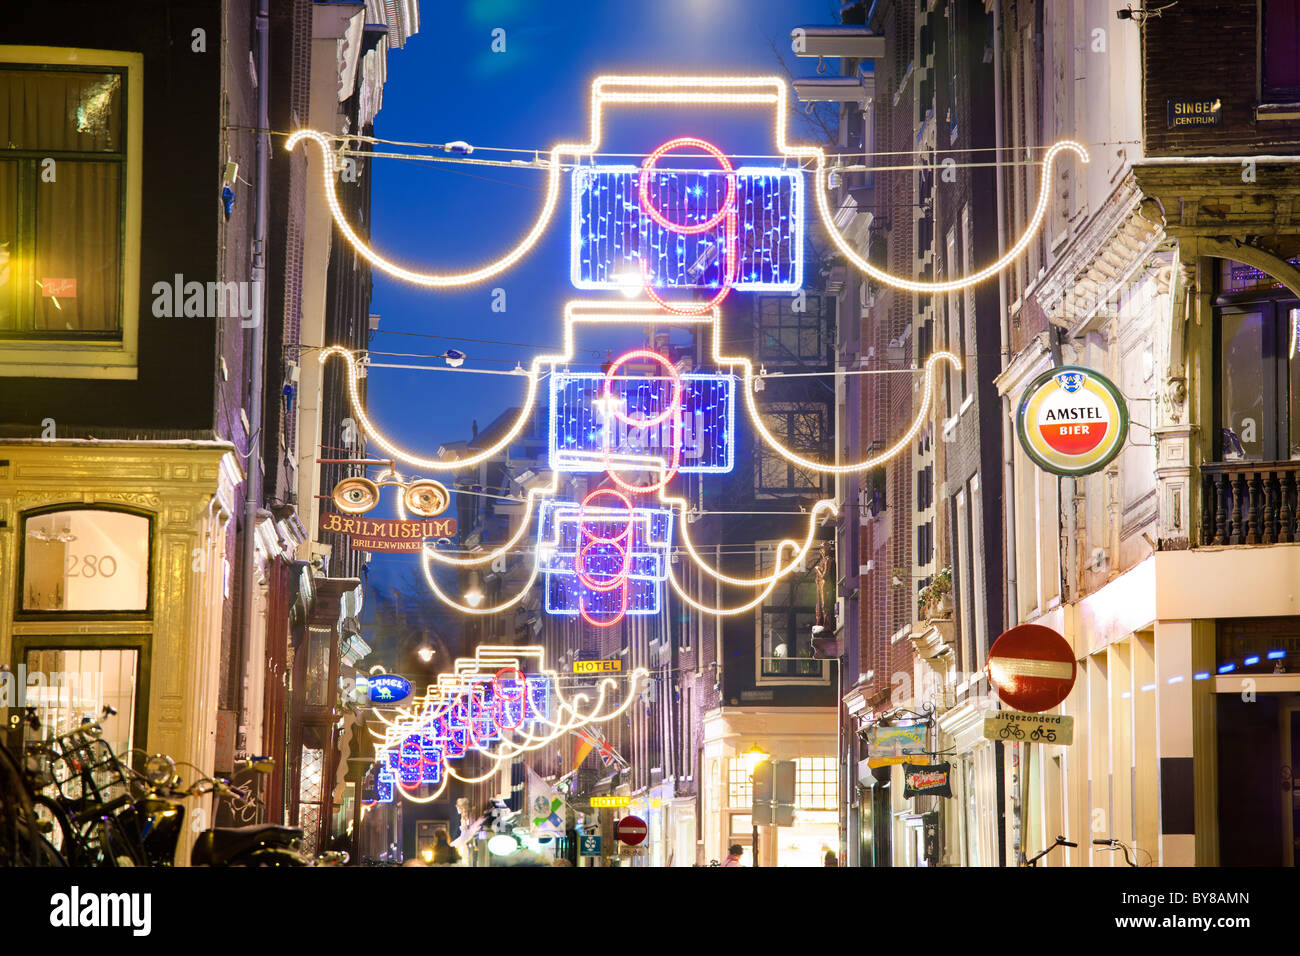 Amsterdam, De Negen Straatjes. Festive lights at dusk during the Holiday Season in the Nine Little Streets shopping - Stock Image